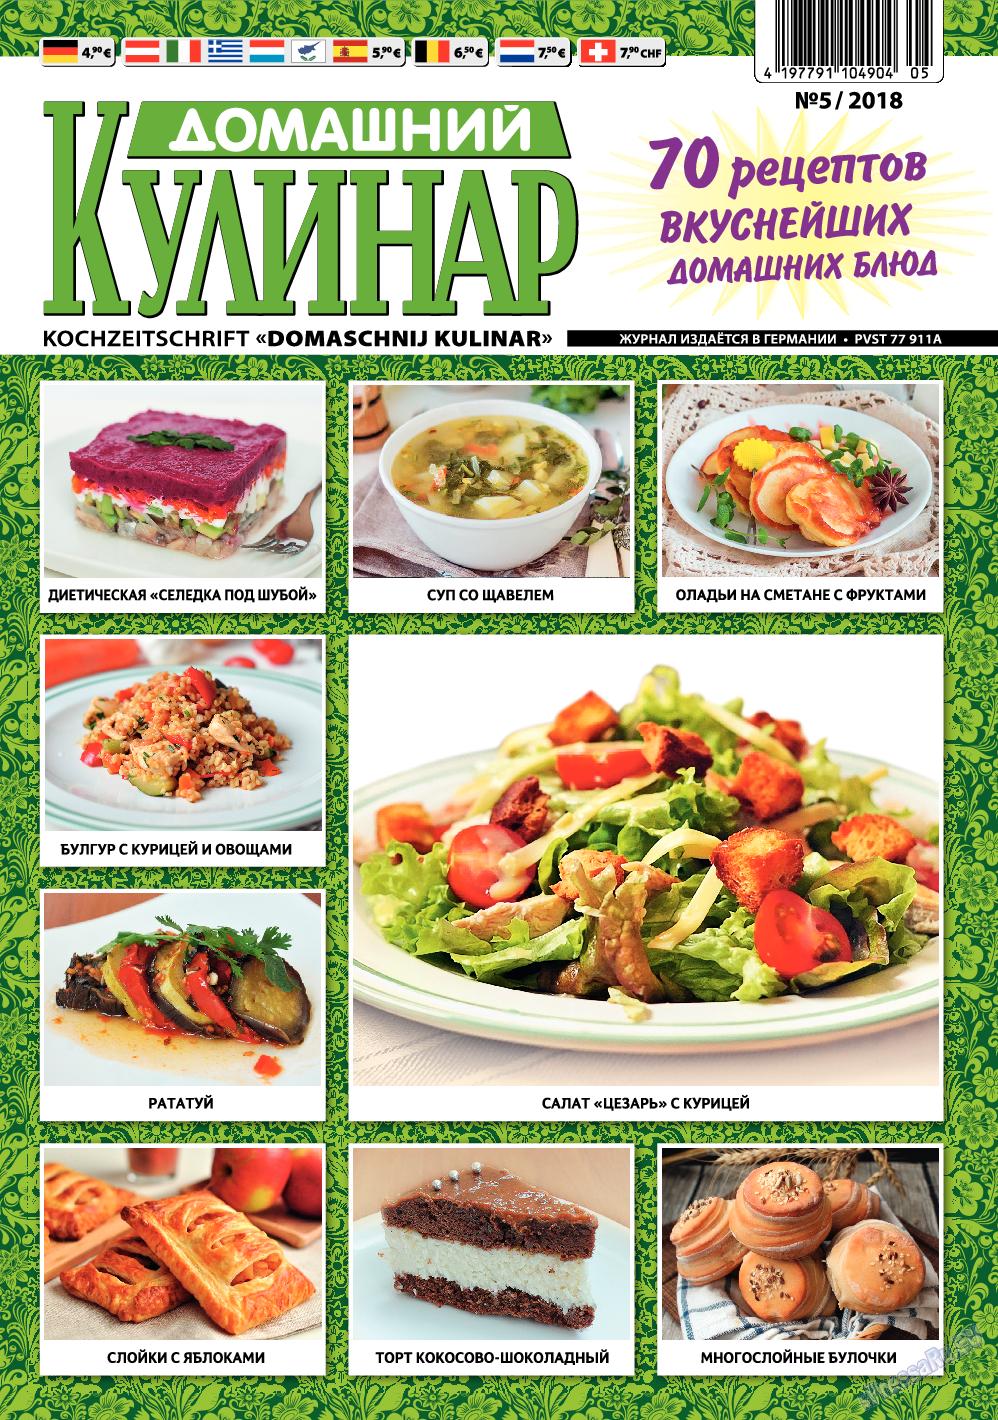 Домашний кулинар (журнал). 2018 год, номер 5, стр. 1